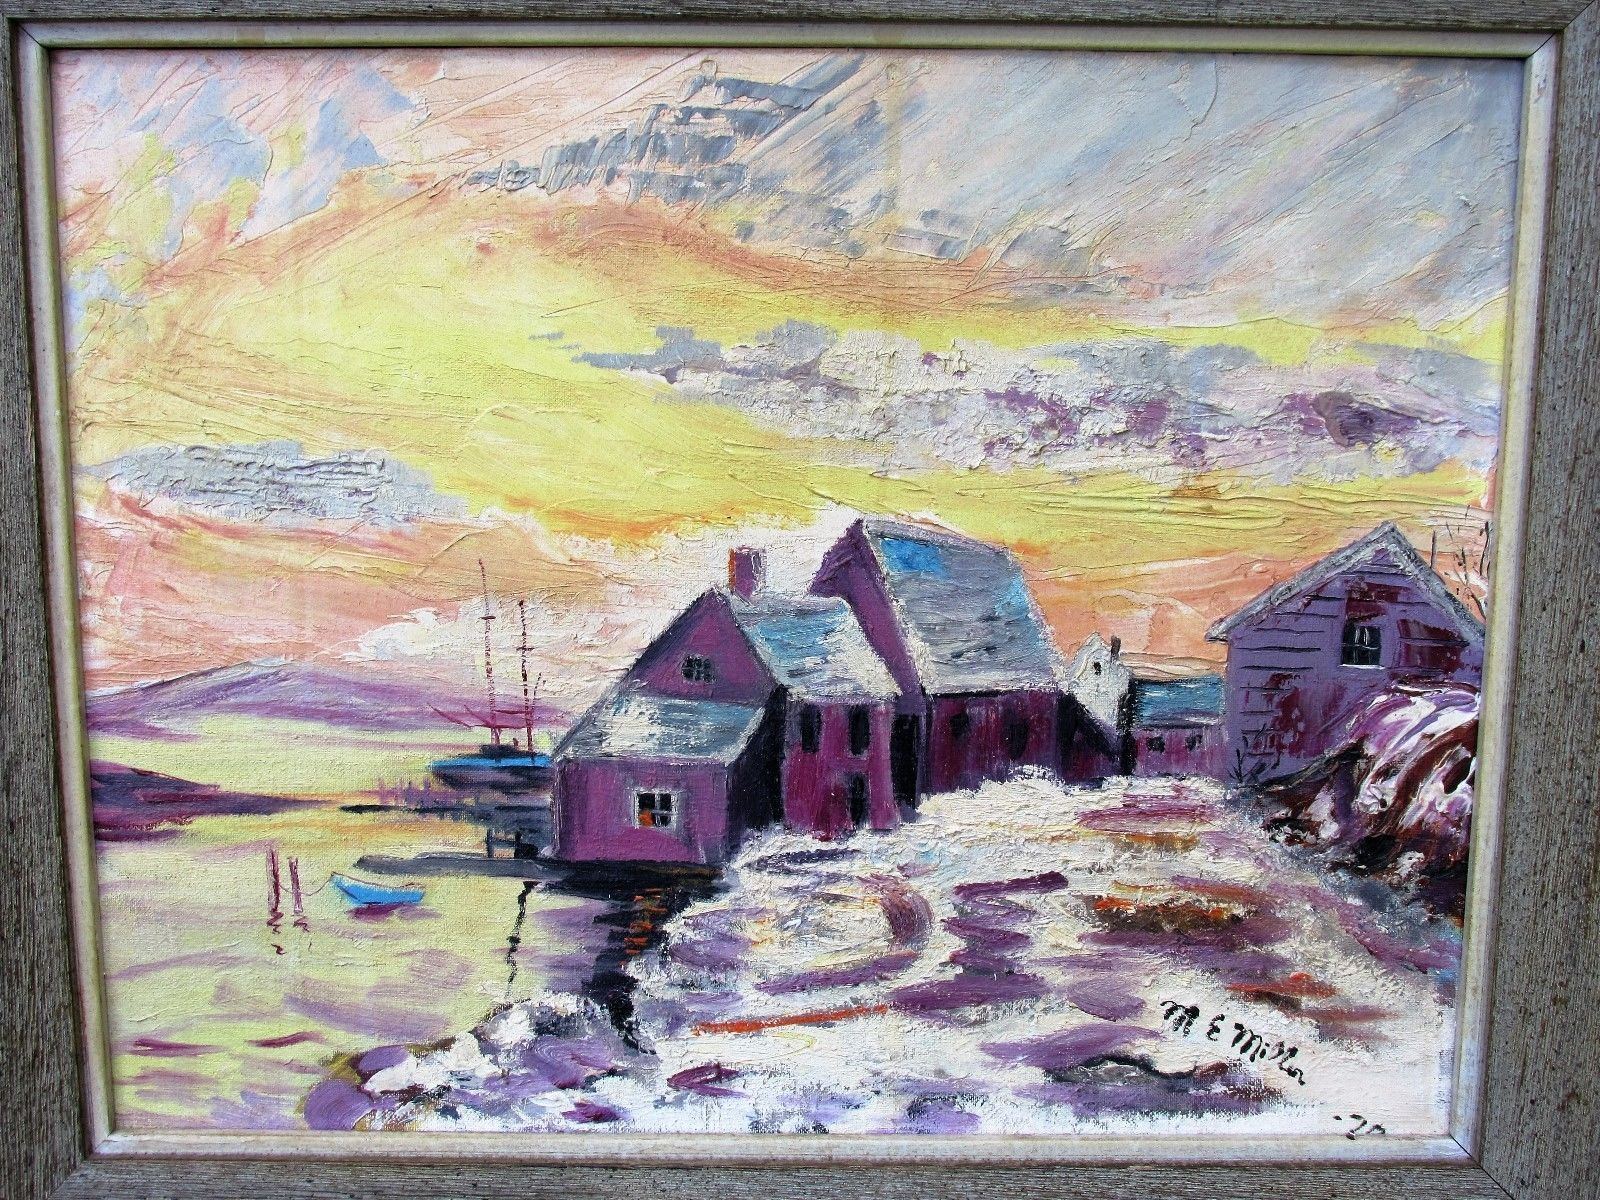 Vintage Oil Painting on Canvas Board Serene Harbor Scene at Twilight Signed https://t.co/QvNmvoUYCb #Homedecor https://t.co/kibygB5vaO